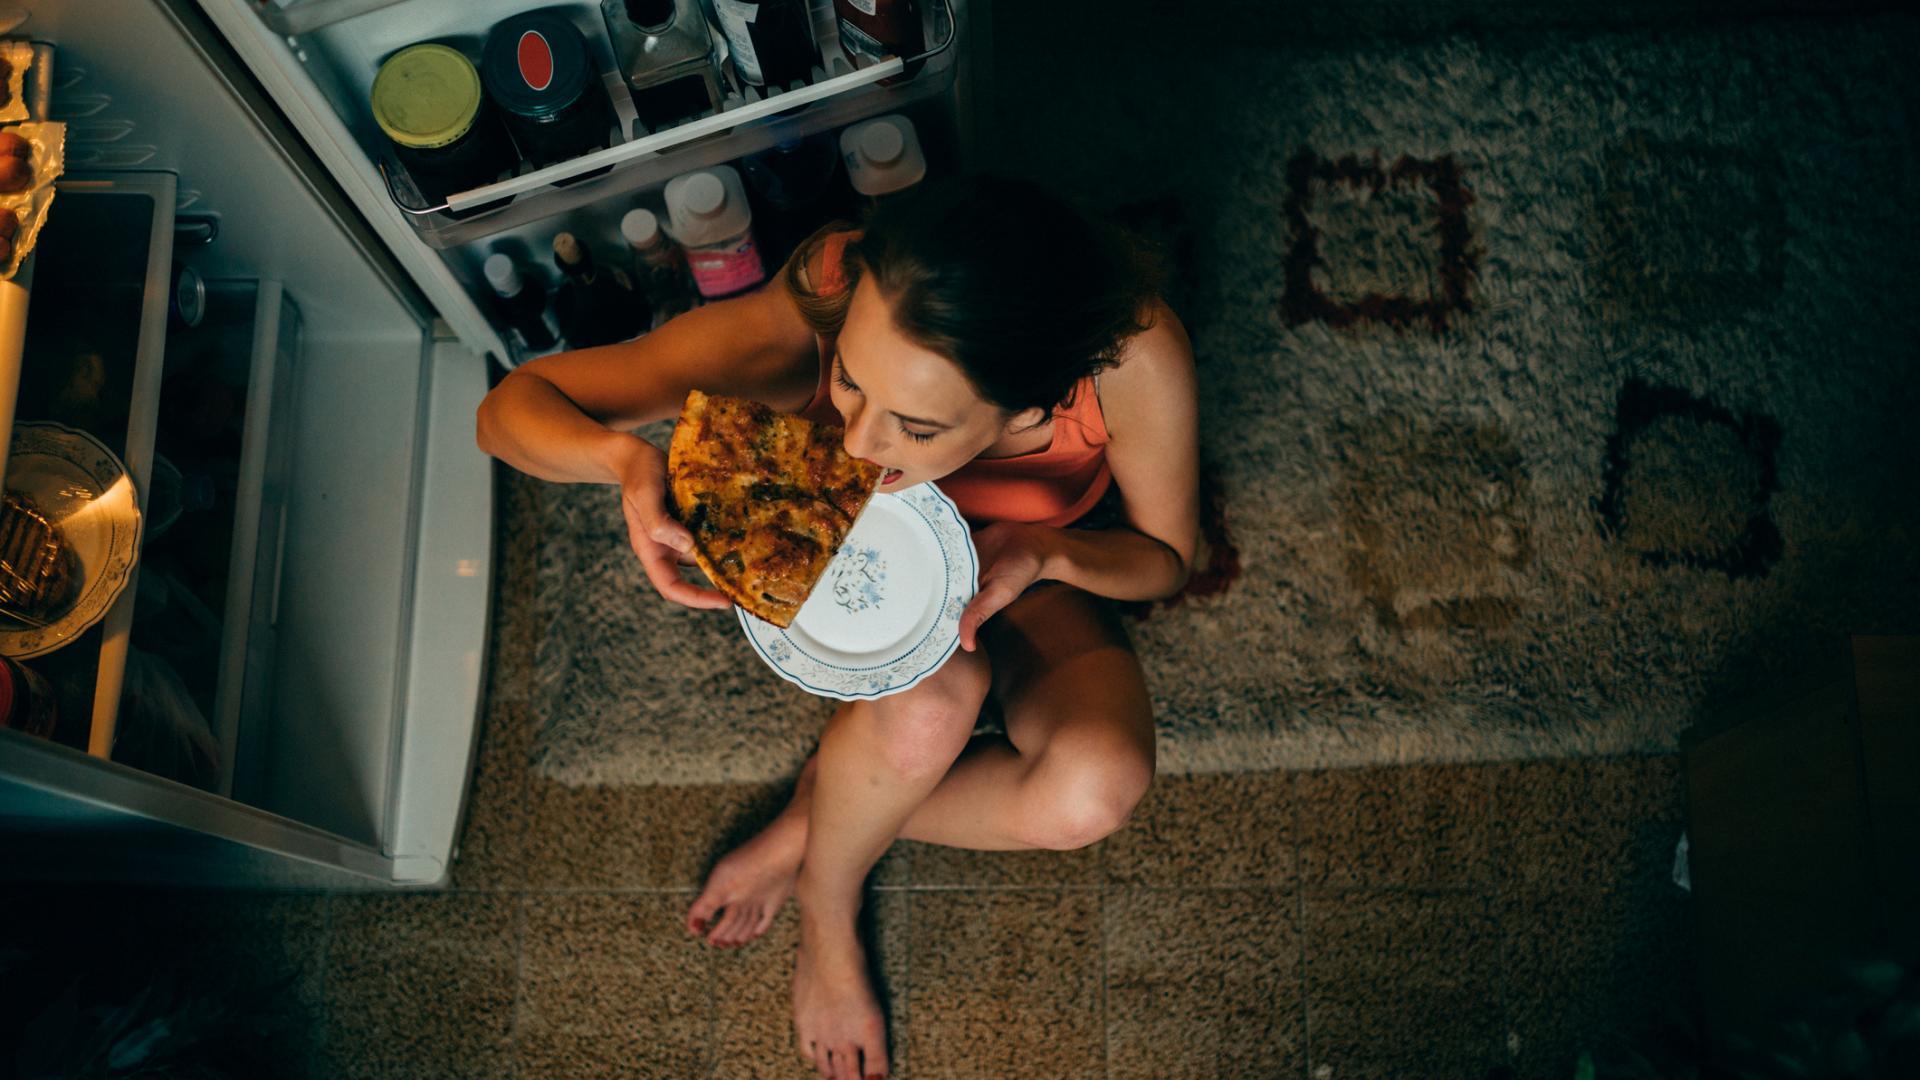 Frau snackt nachts pizza vor kühlschrank